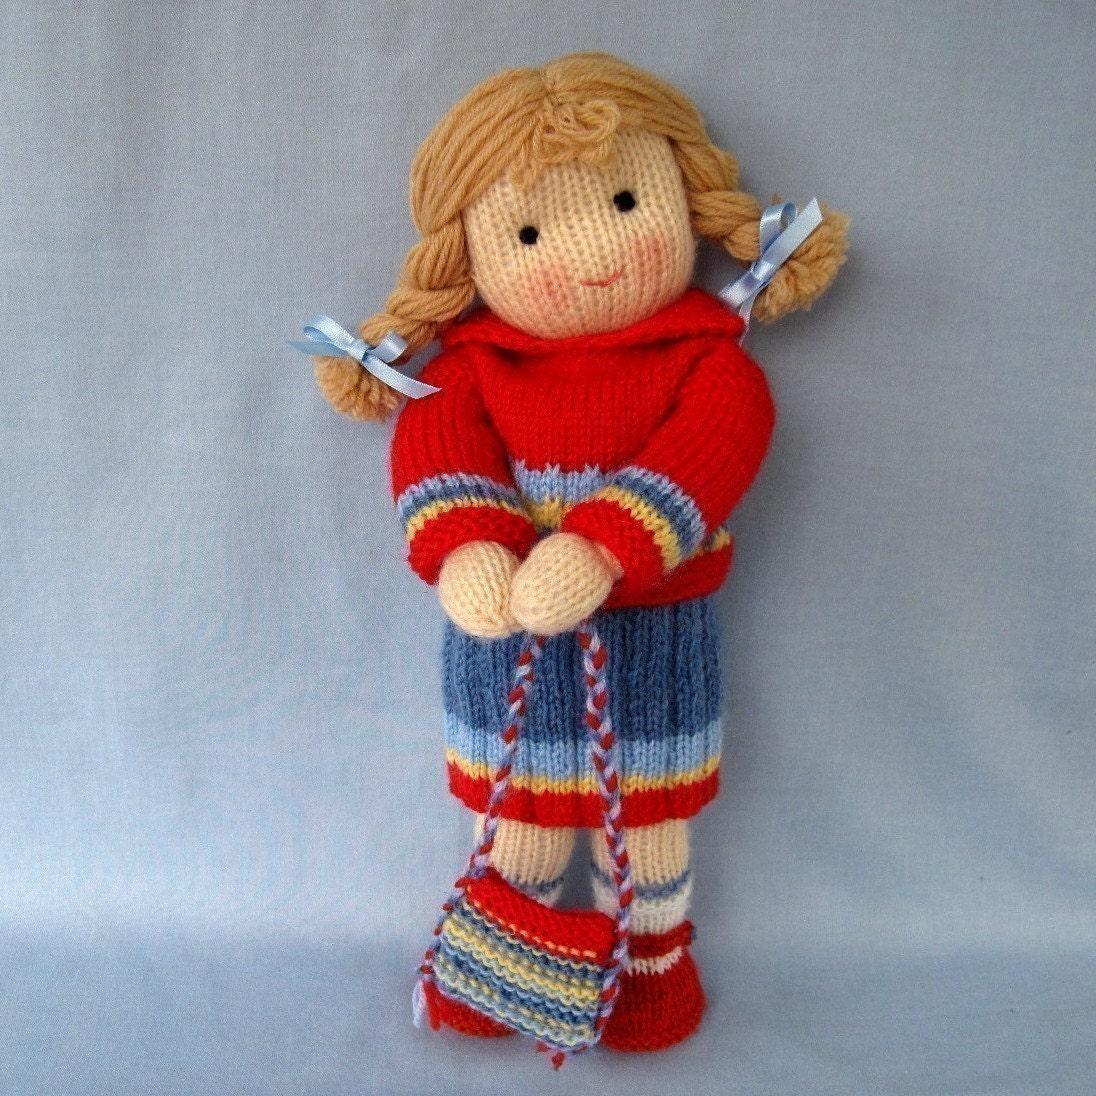 TILLY به مدرسه می رود -- عروسک اسباب بازی knitted -- پی دی اف ایمیل بافندگی الگوی